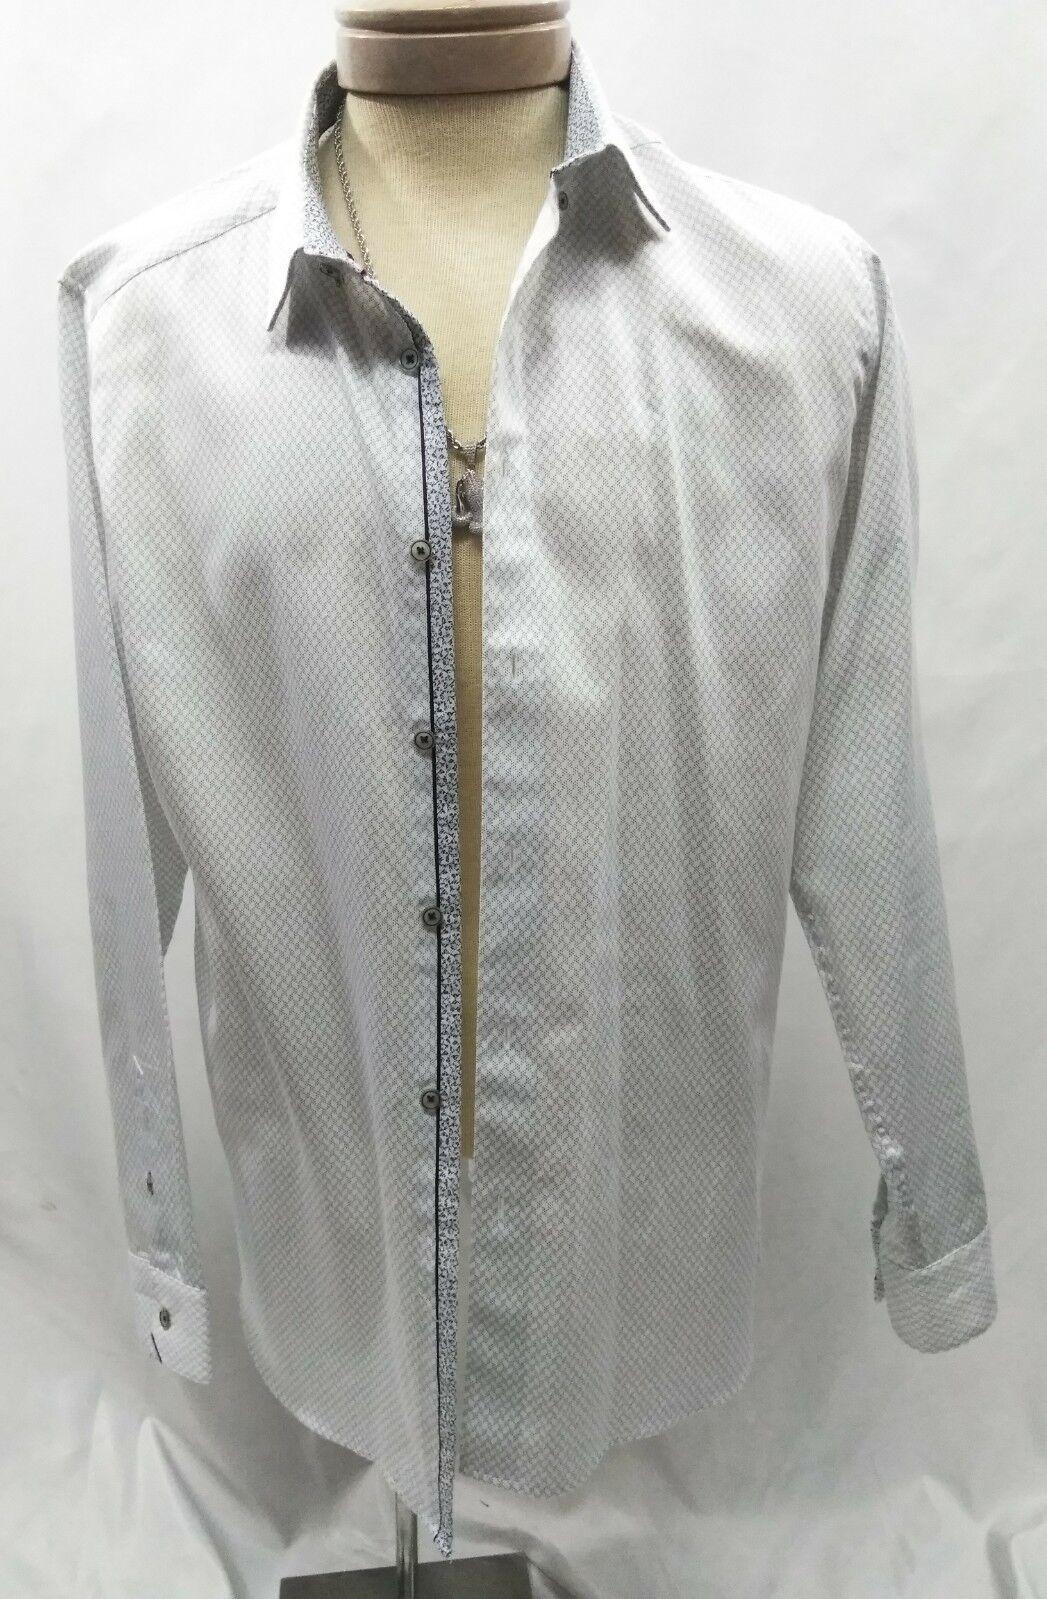 NWOT Ted baker White Detailed Shirt Size 5